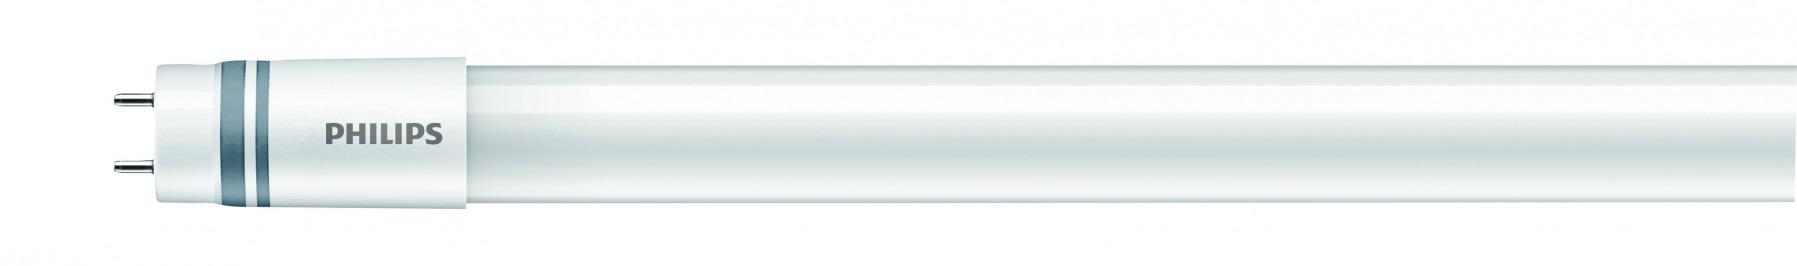 Philips CorePro LED tube 150 cm InstantFit Röhre für EVG 20 Watt Lichtfarbe wählbar